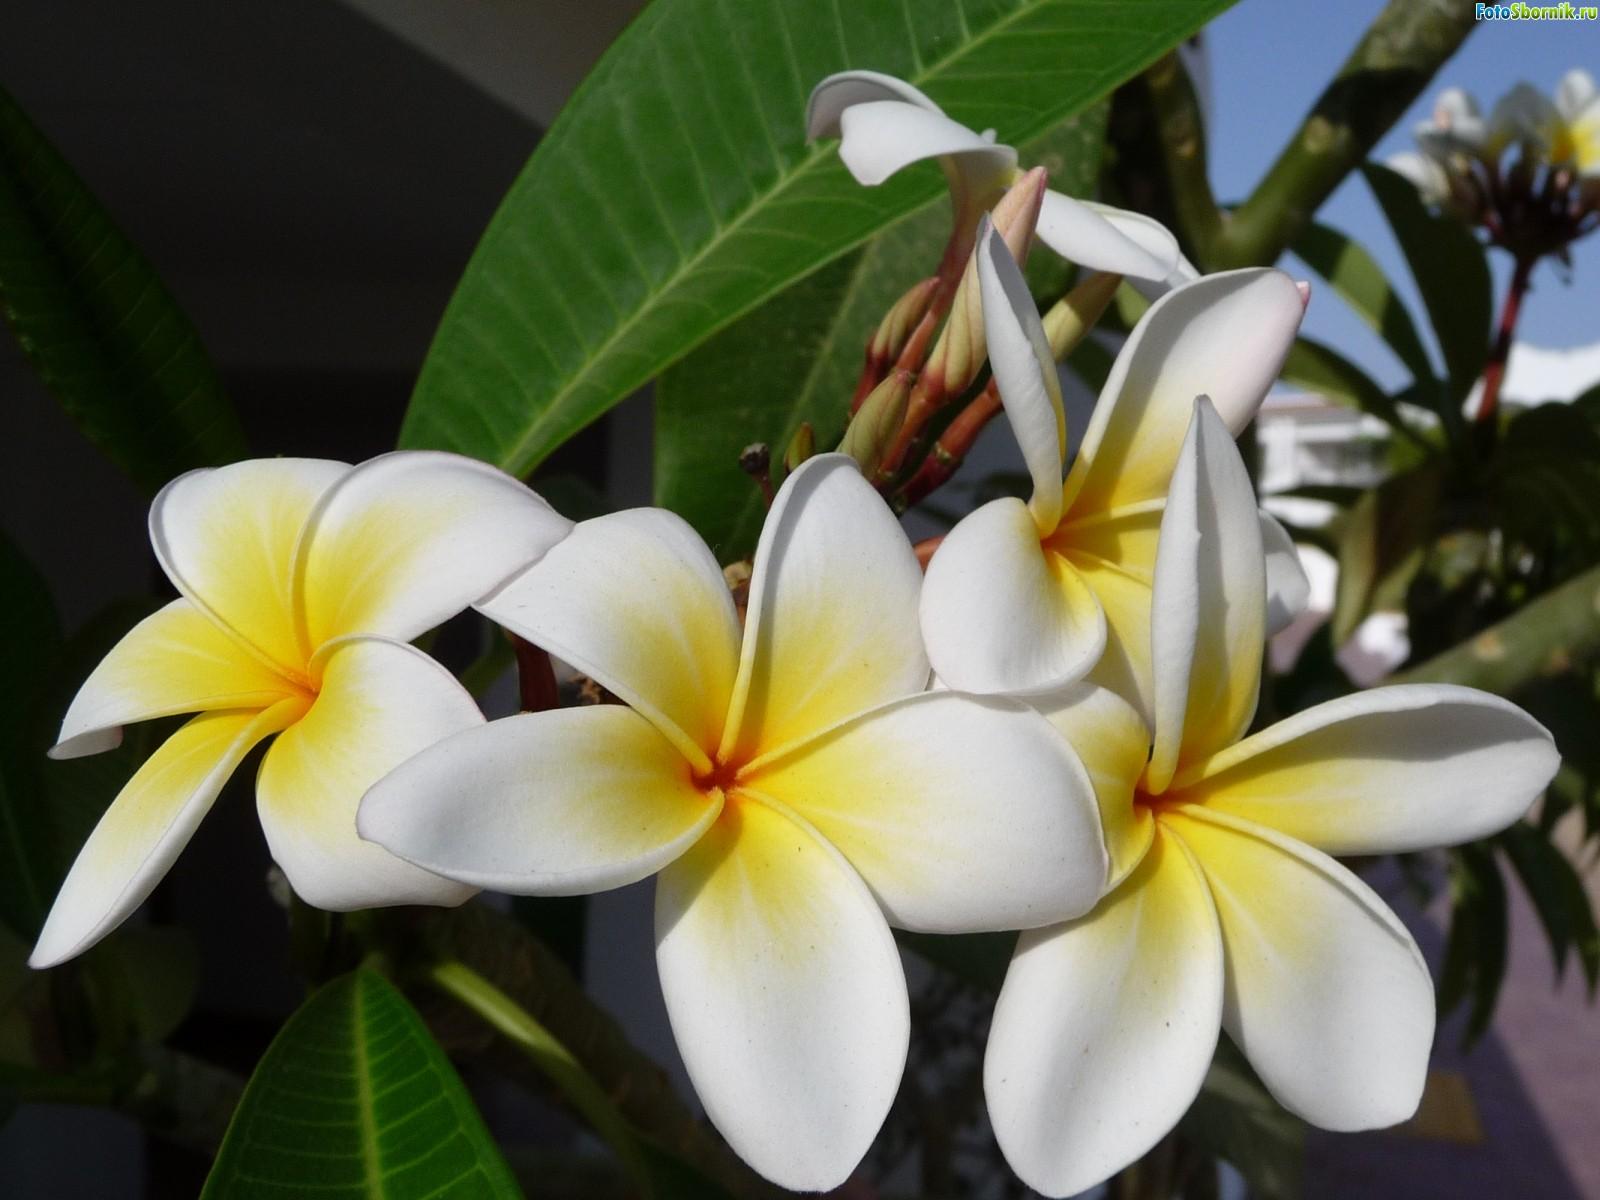 как выглядит цветок фикус фото